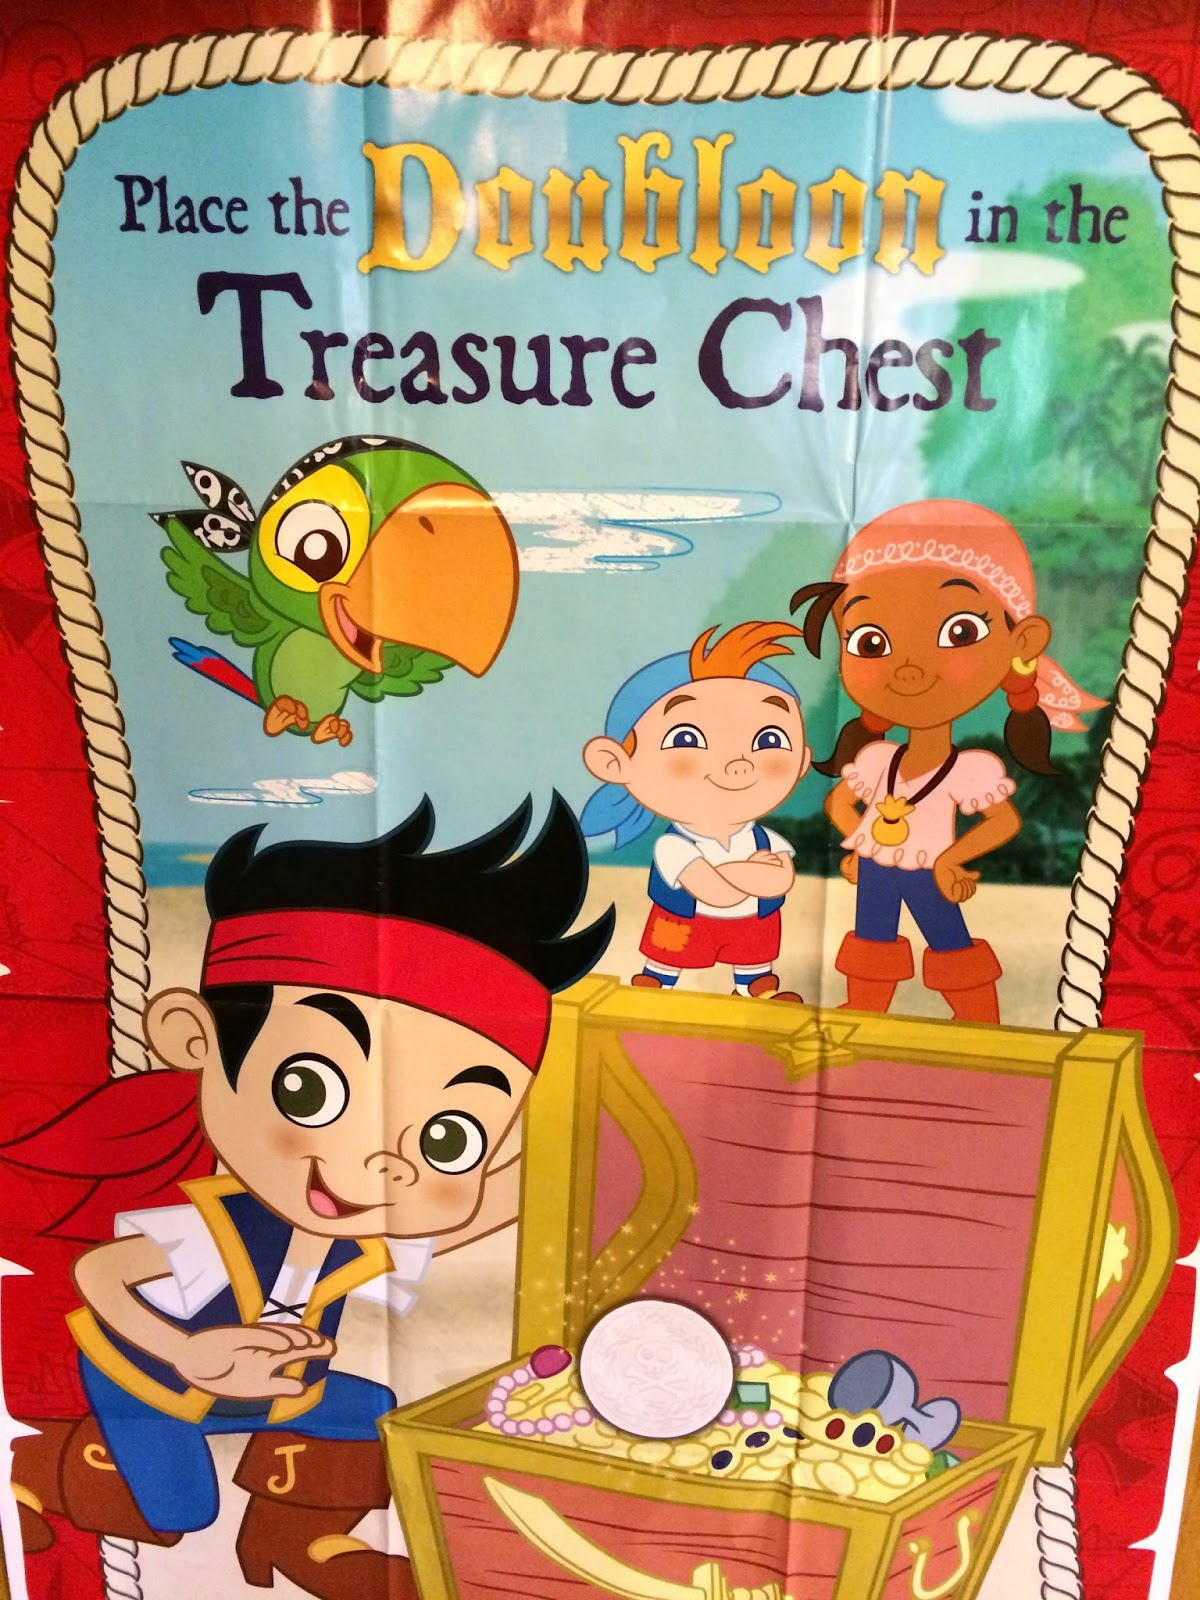 #DisneyKids Preschool Playdate